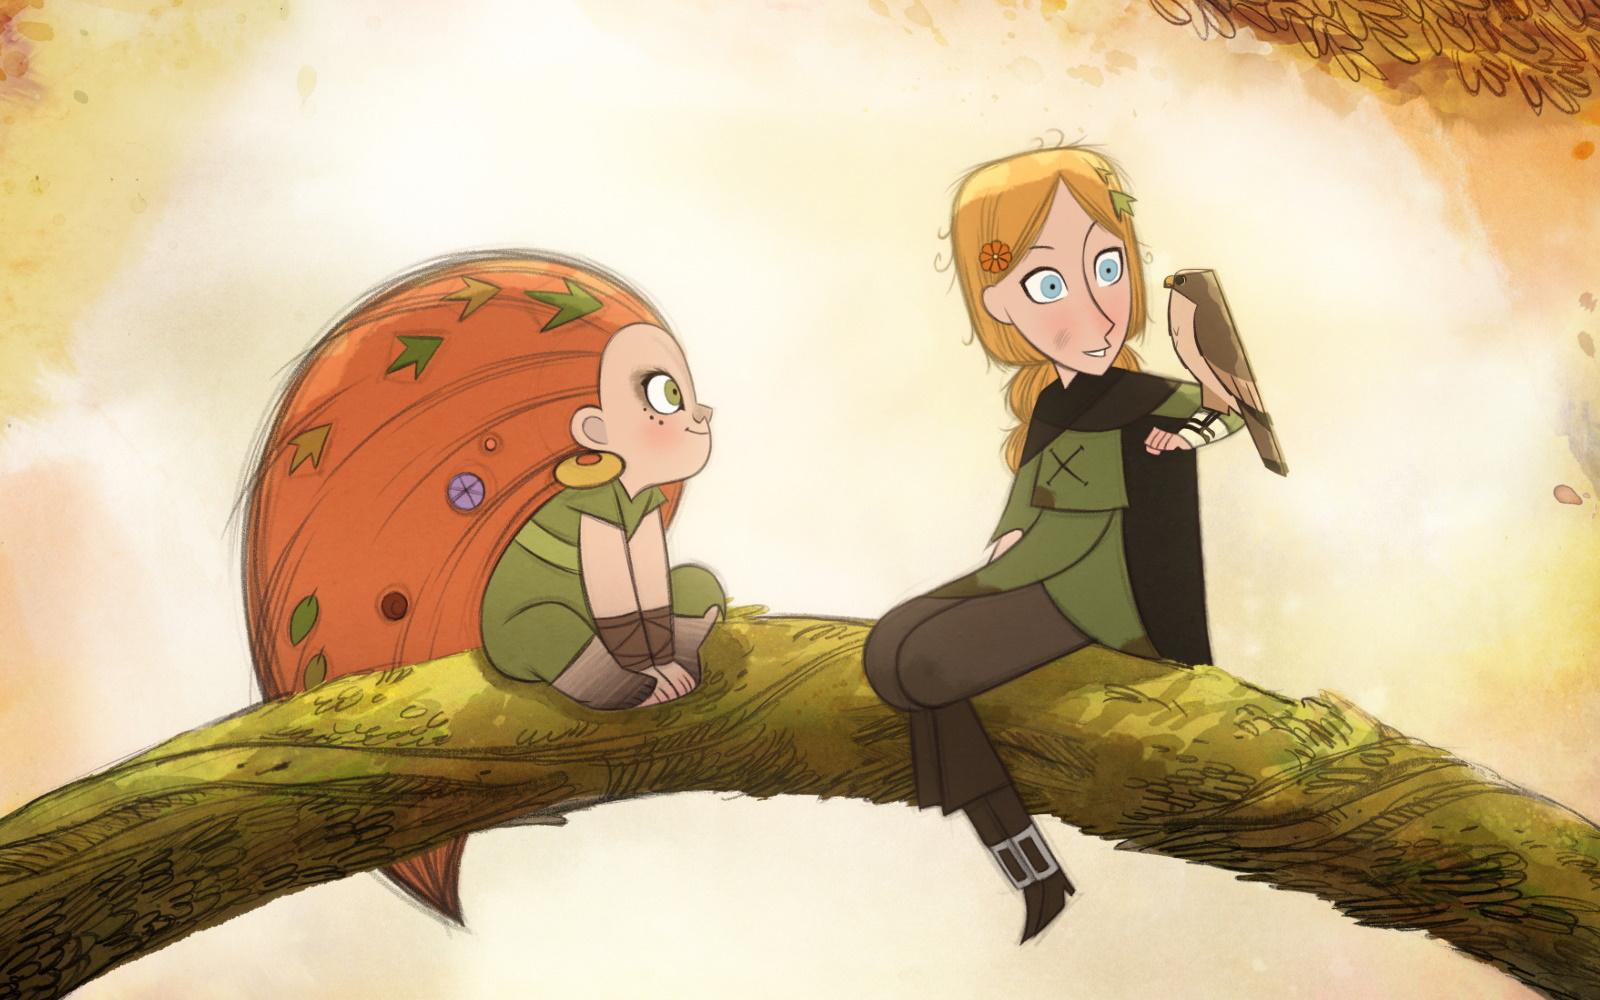 Irish Animation Studio, Cartoon Saloon Gets Yet Another Oscar Nomination